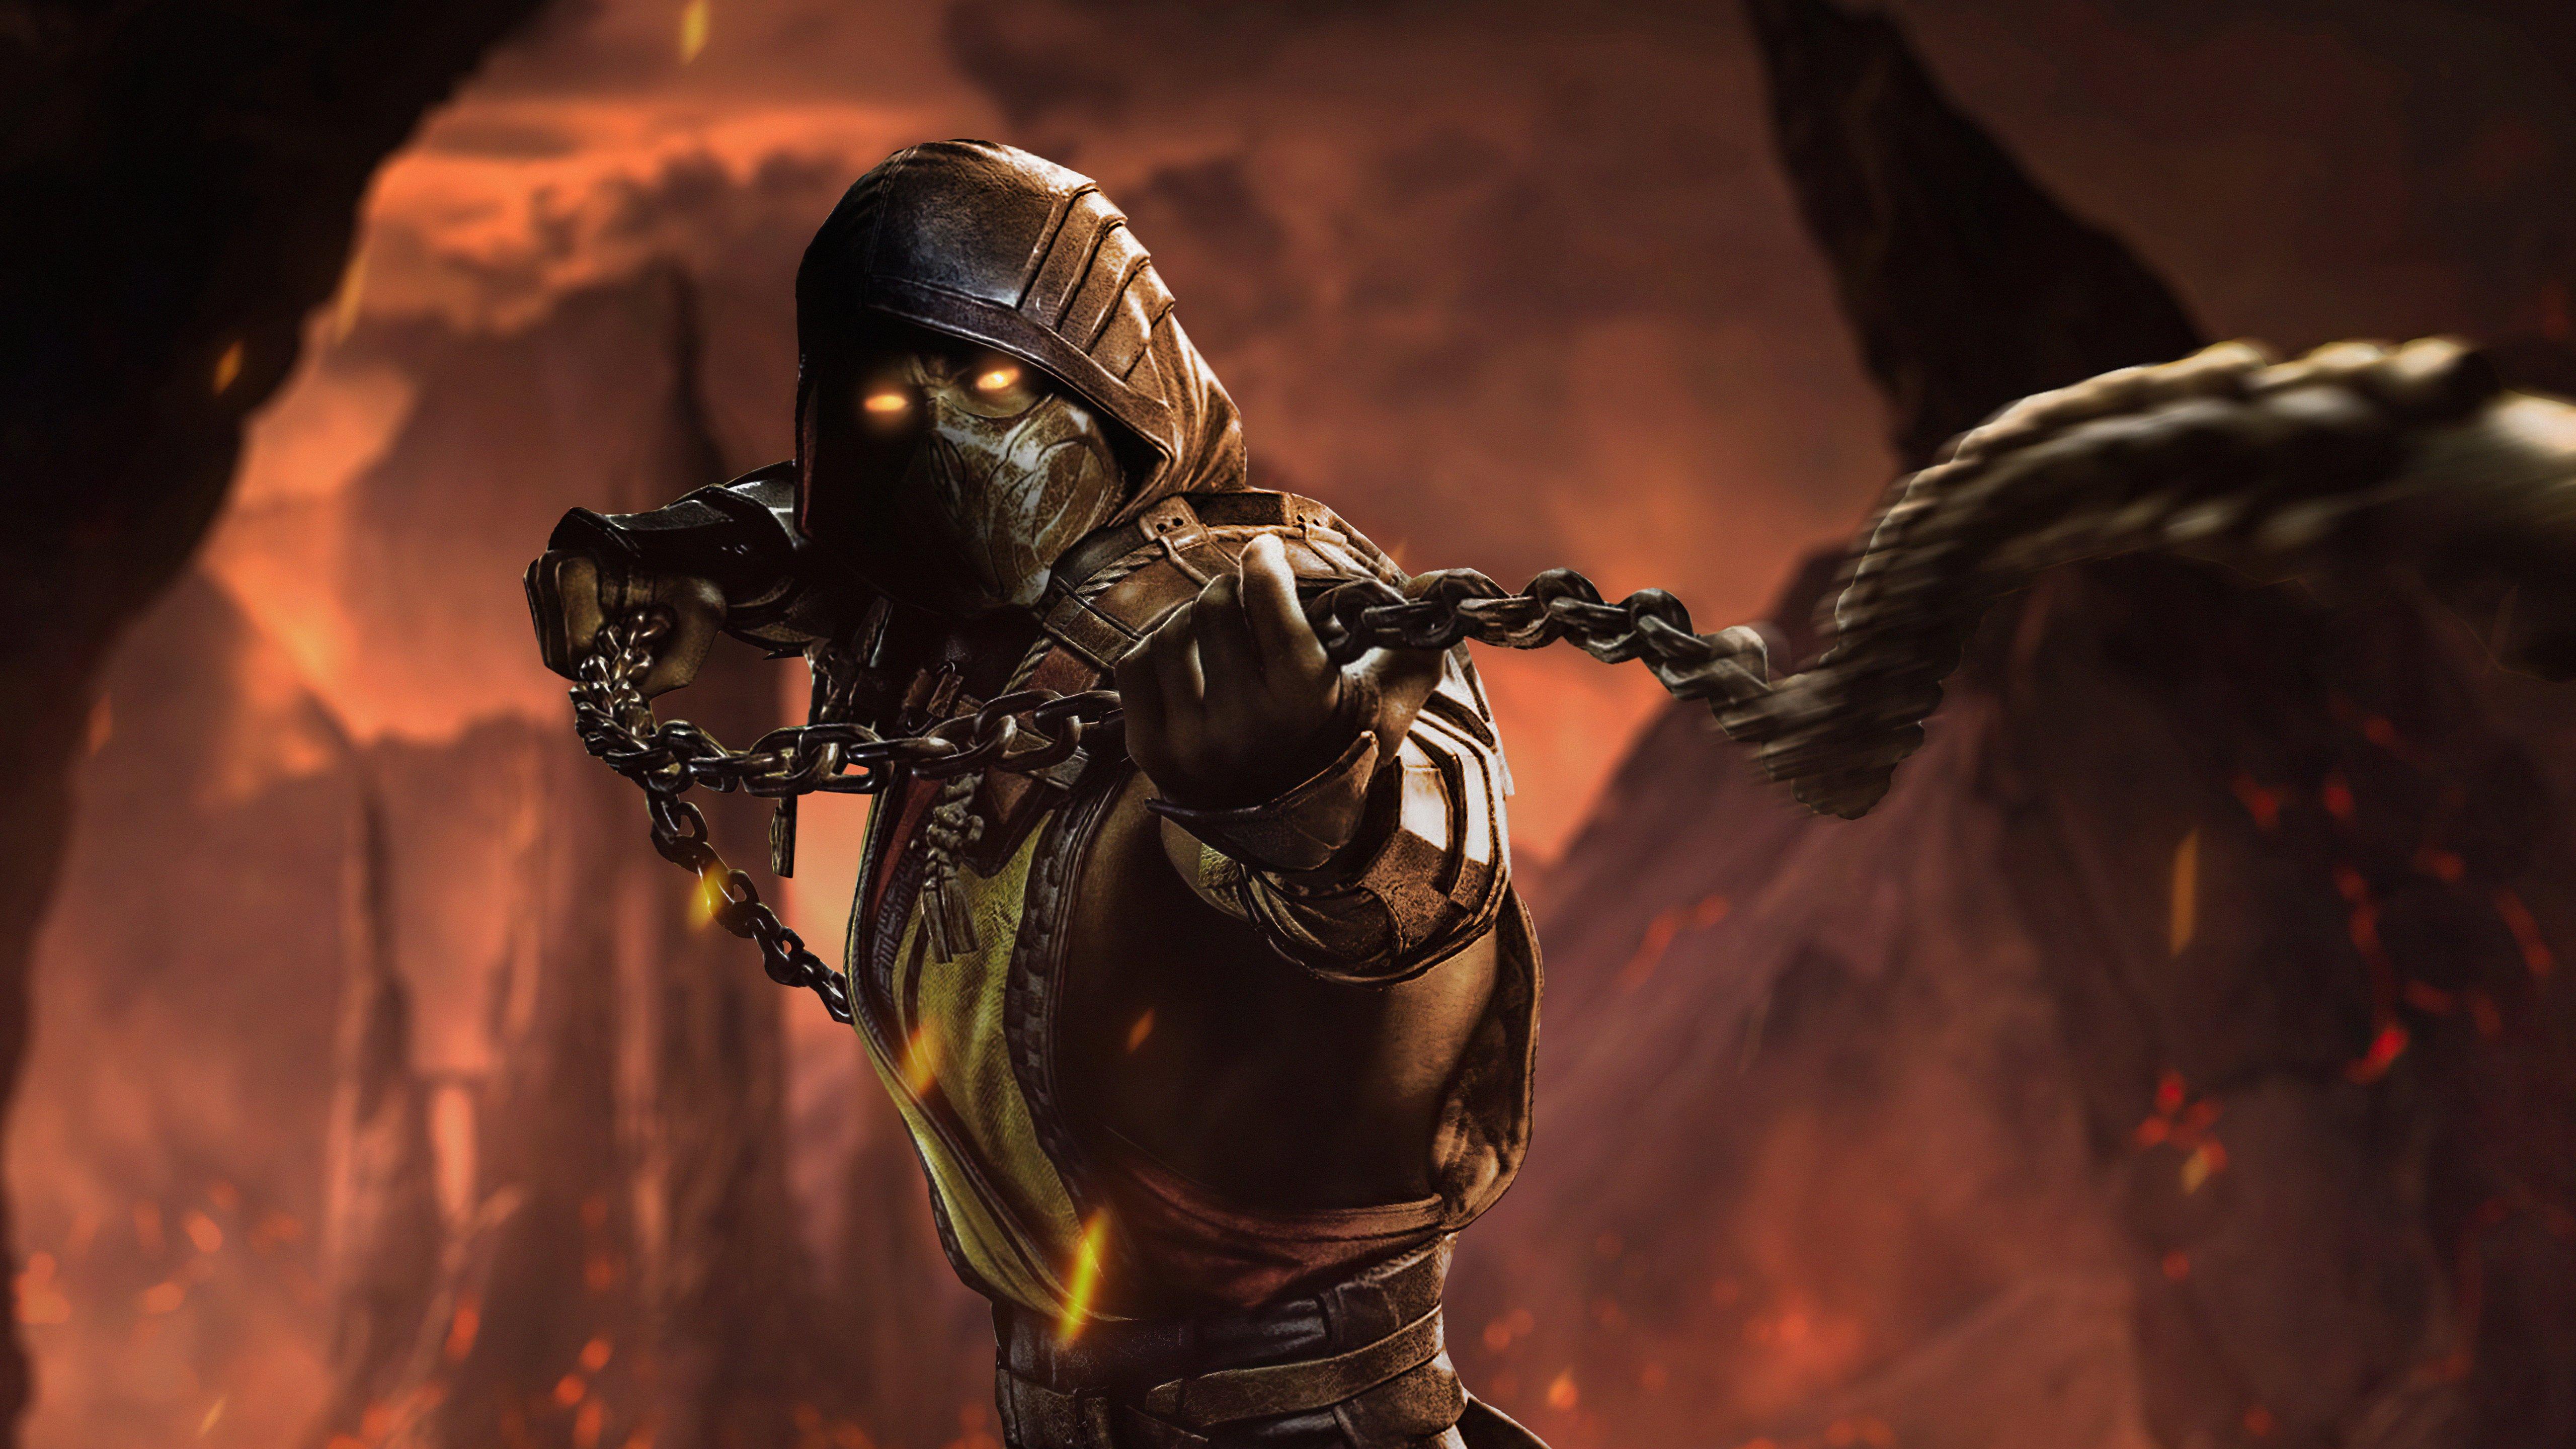 Fondos de pantalla Mortal Kombat Scorpion